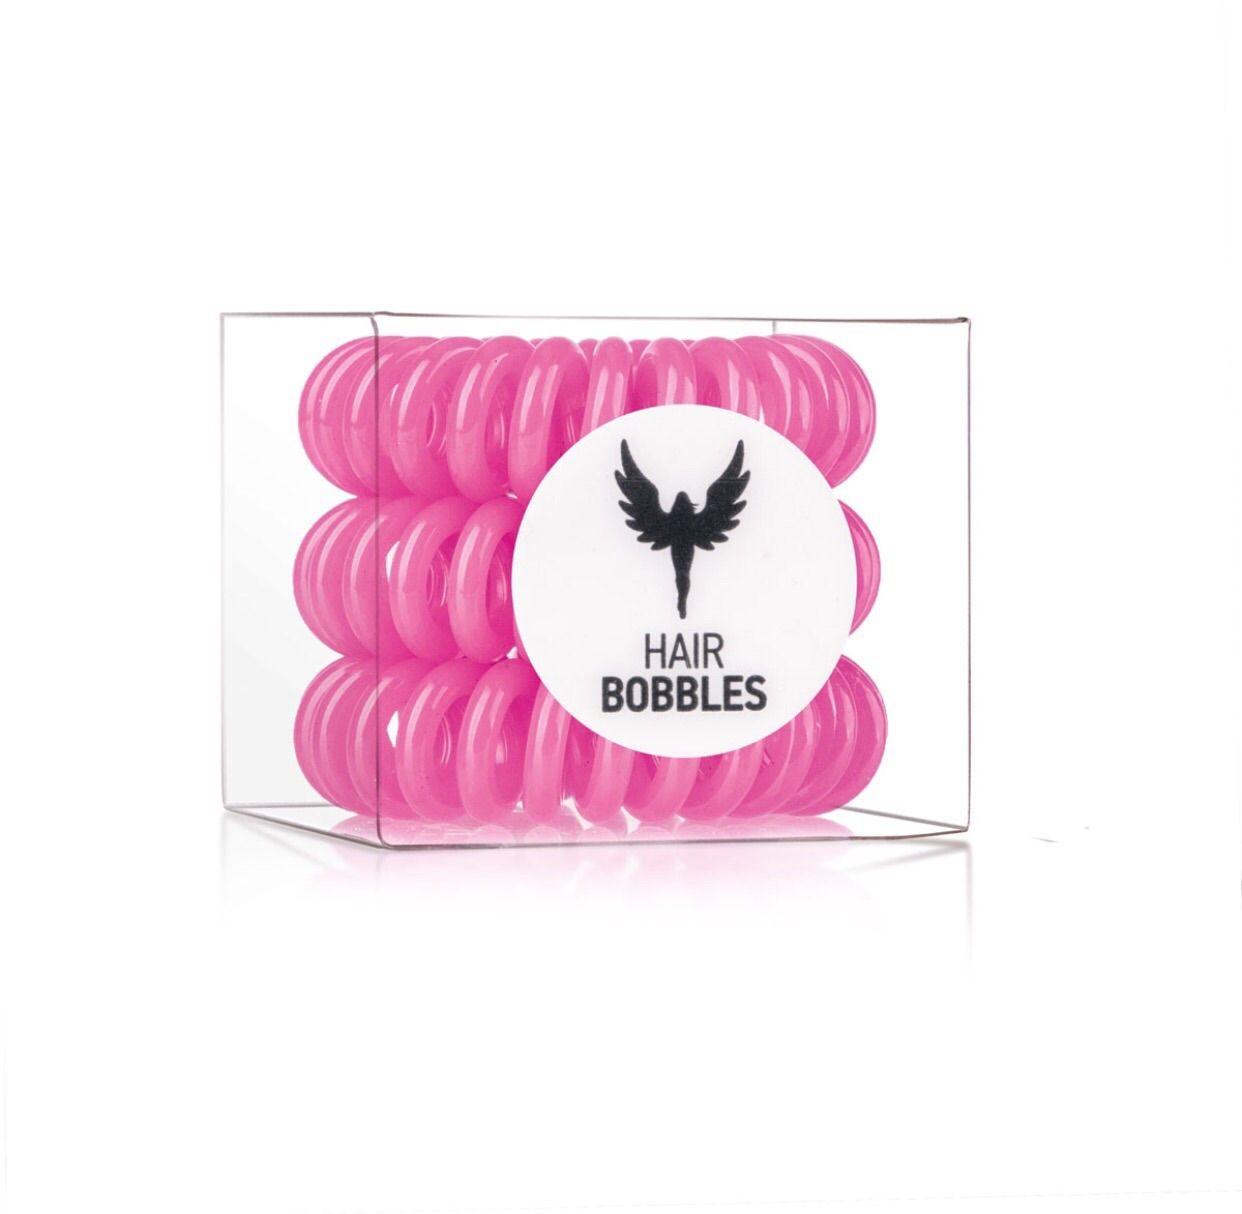 Elastico per capelli HH SIMONSEN Hair Bobbles Rosa  - 3pz.